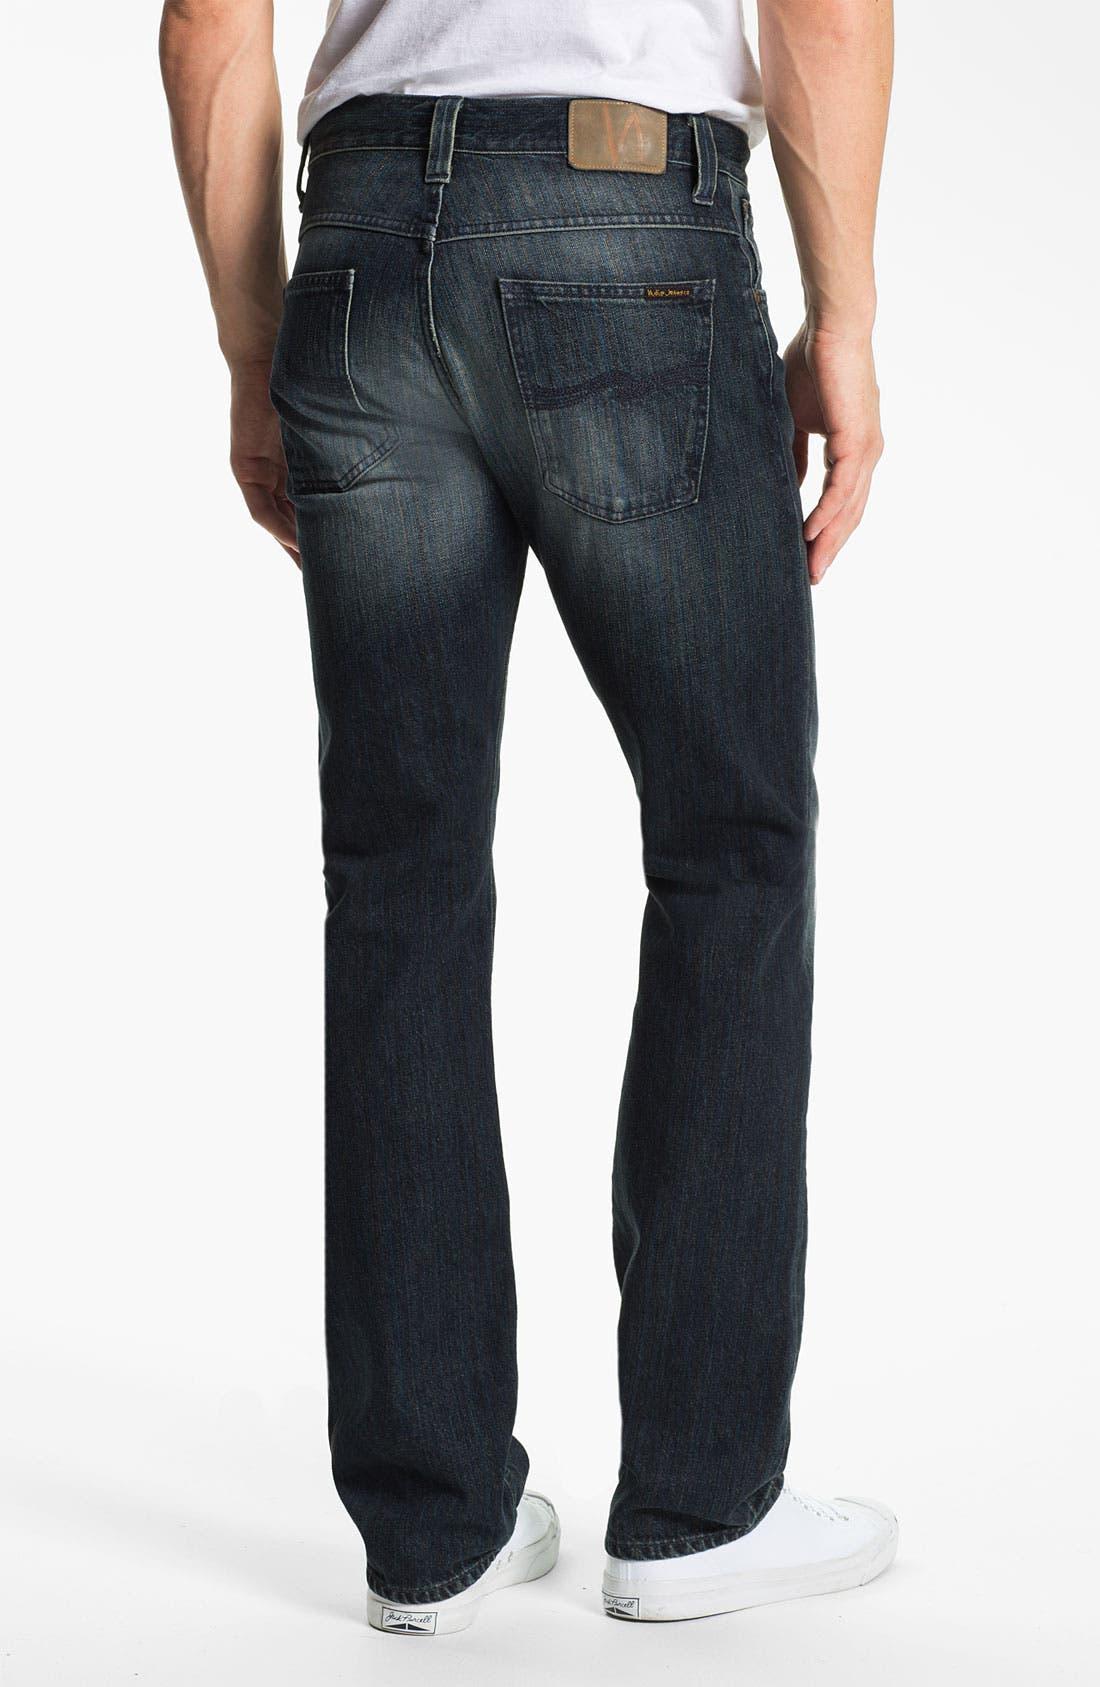 Main Image - Nudie 'Average Joe' Straight Leg Jeans (Organic Black and Blue)